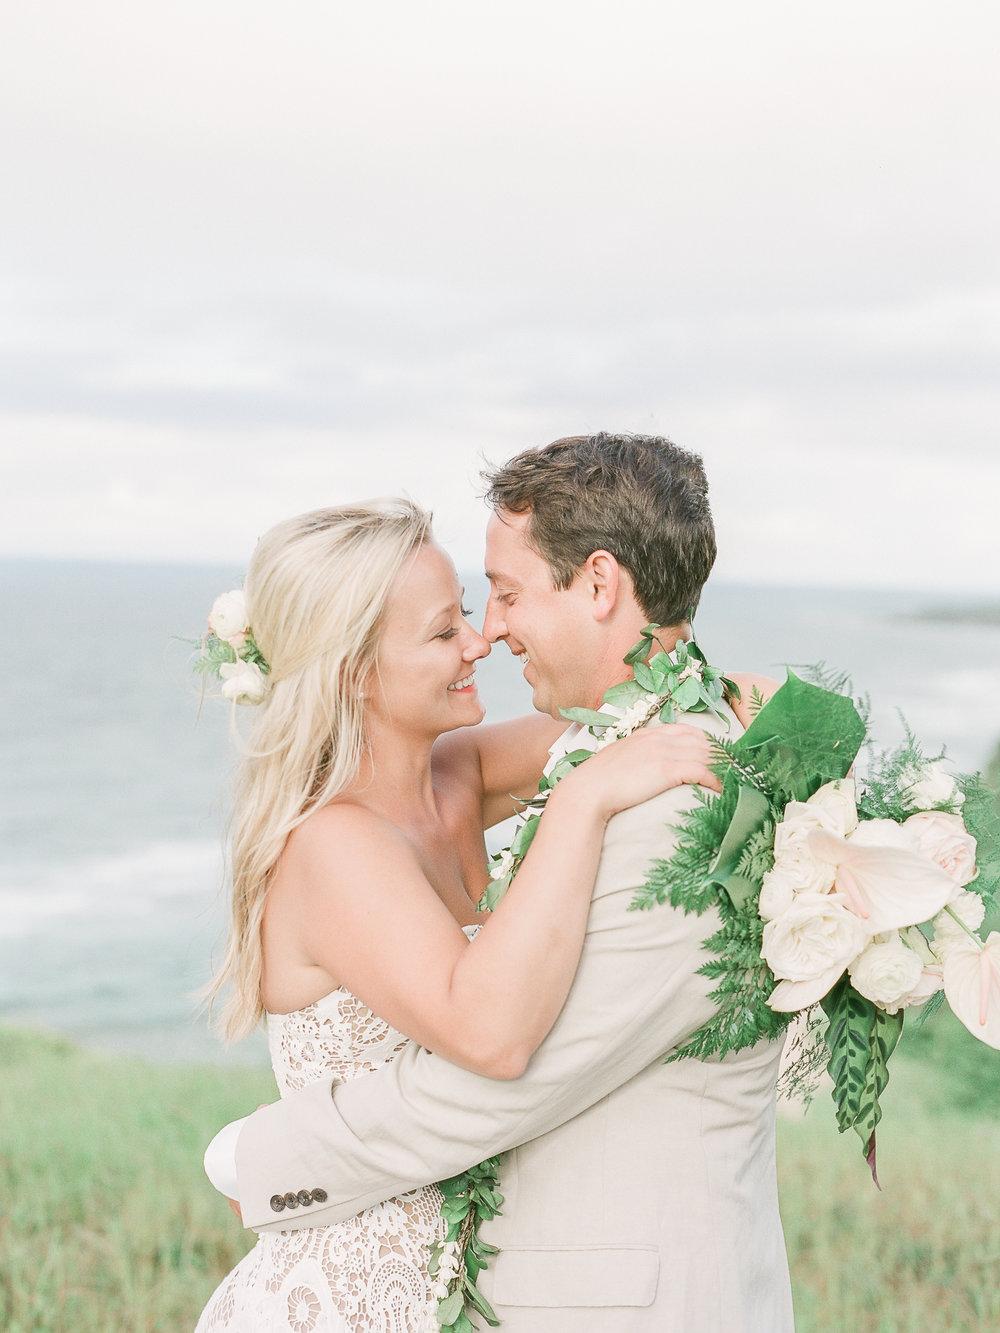 Rachel + Jeff Kauai Island, Julie Paisley Photography